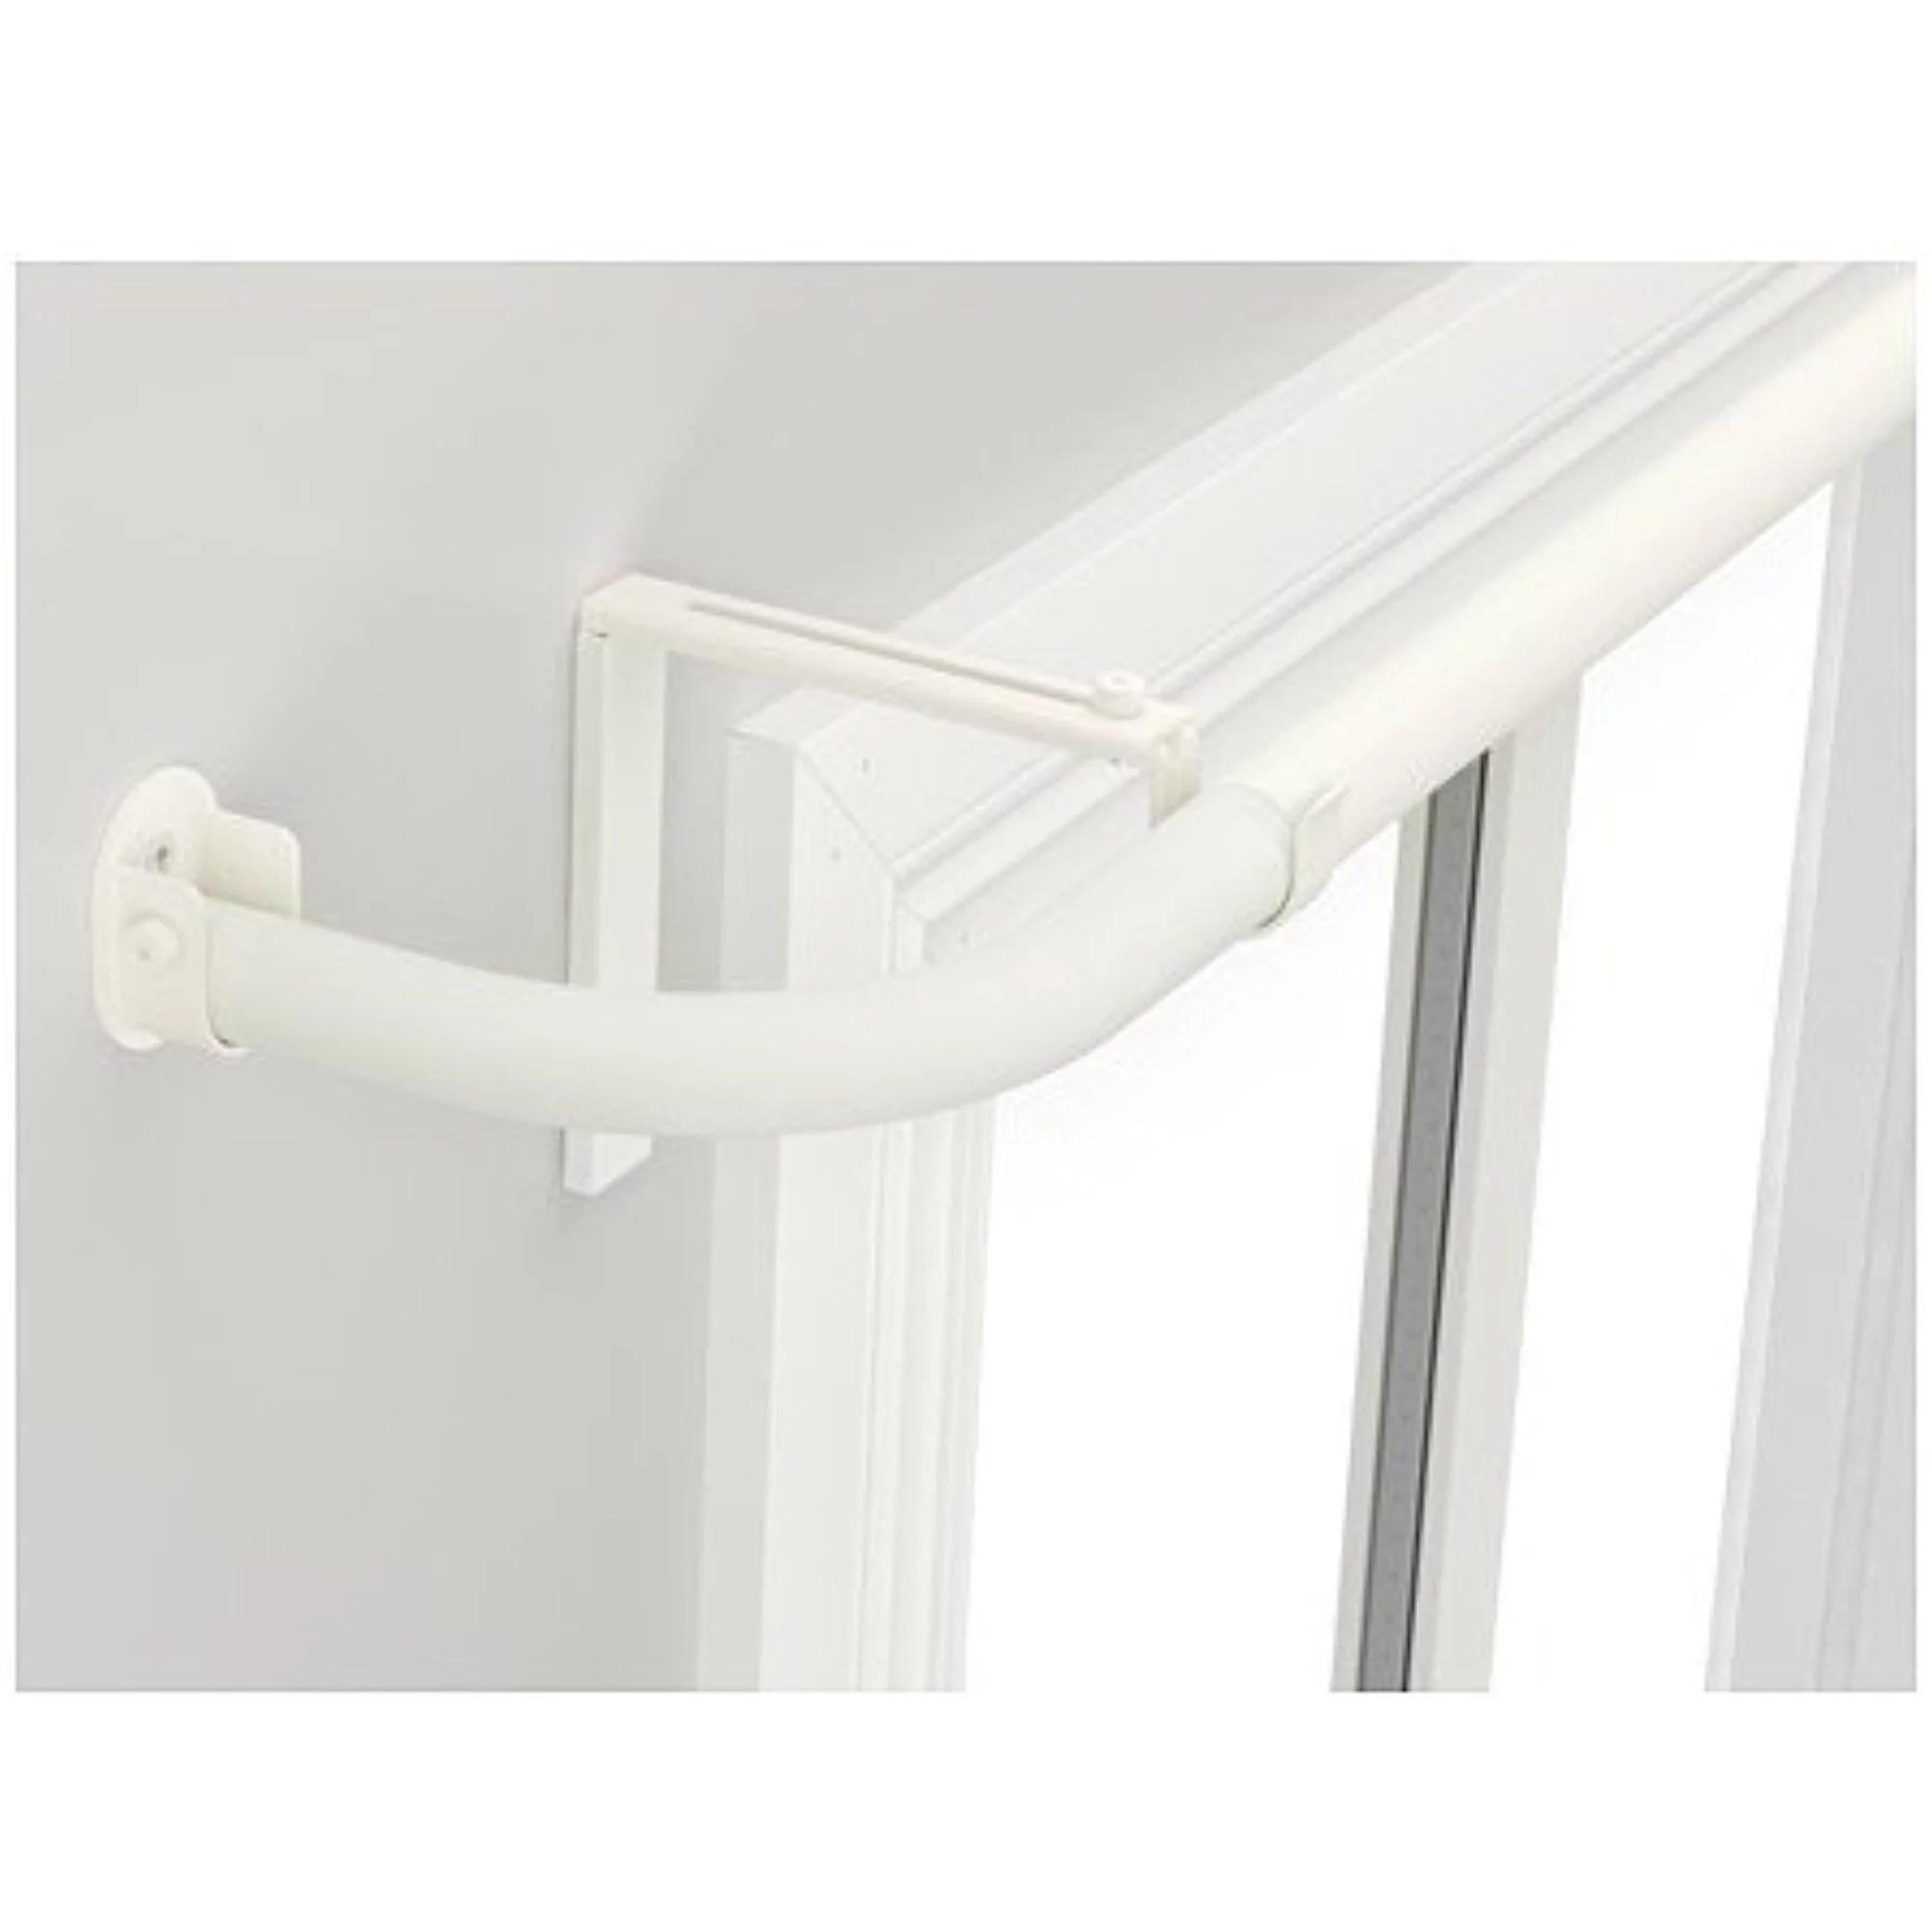 ikea curtain rod combination bay window silver color 82020 8298 1438 walmart com